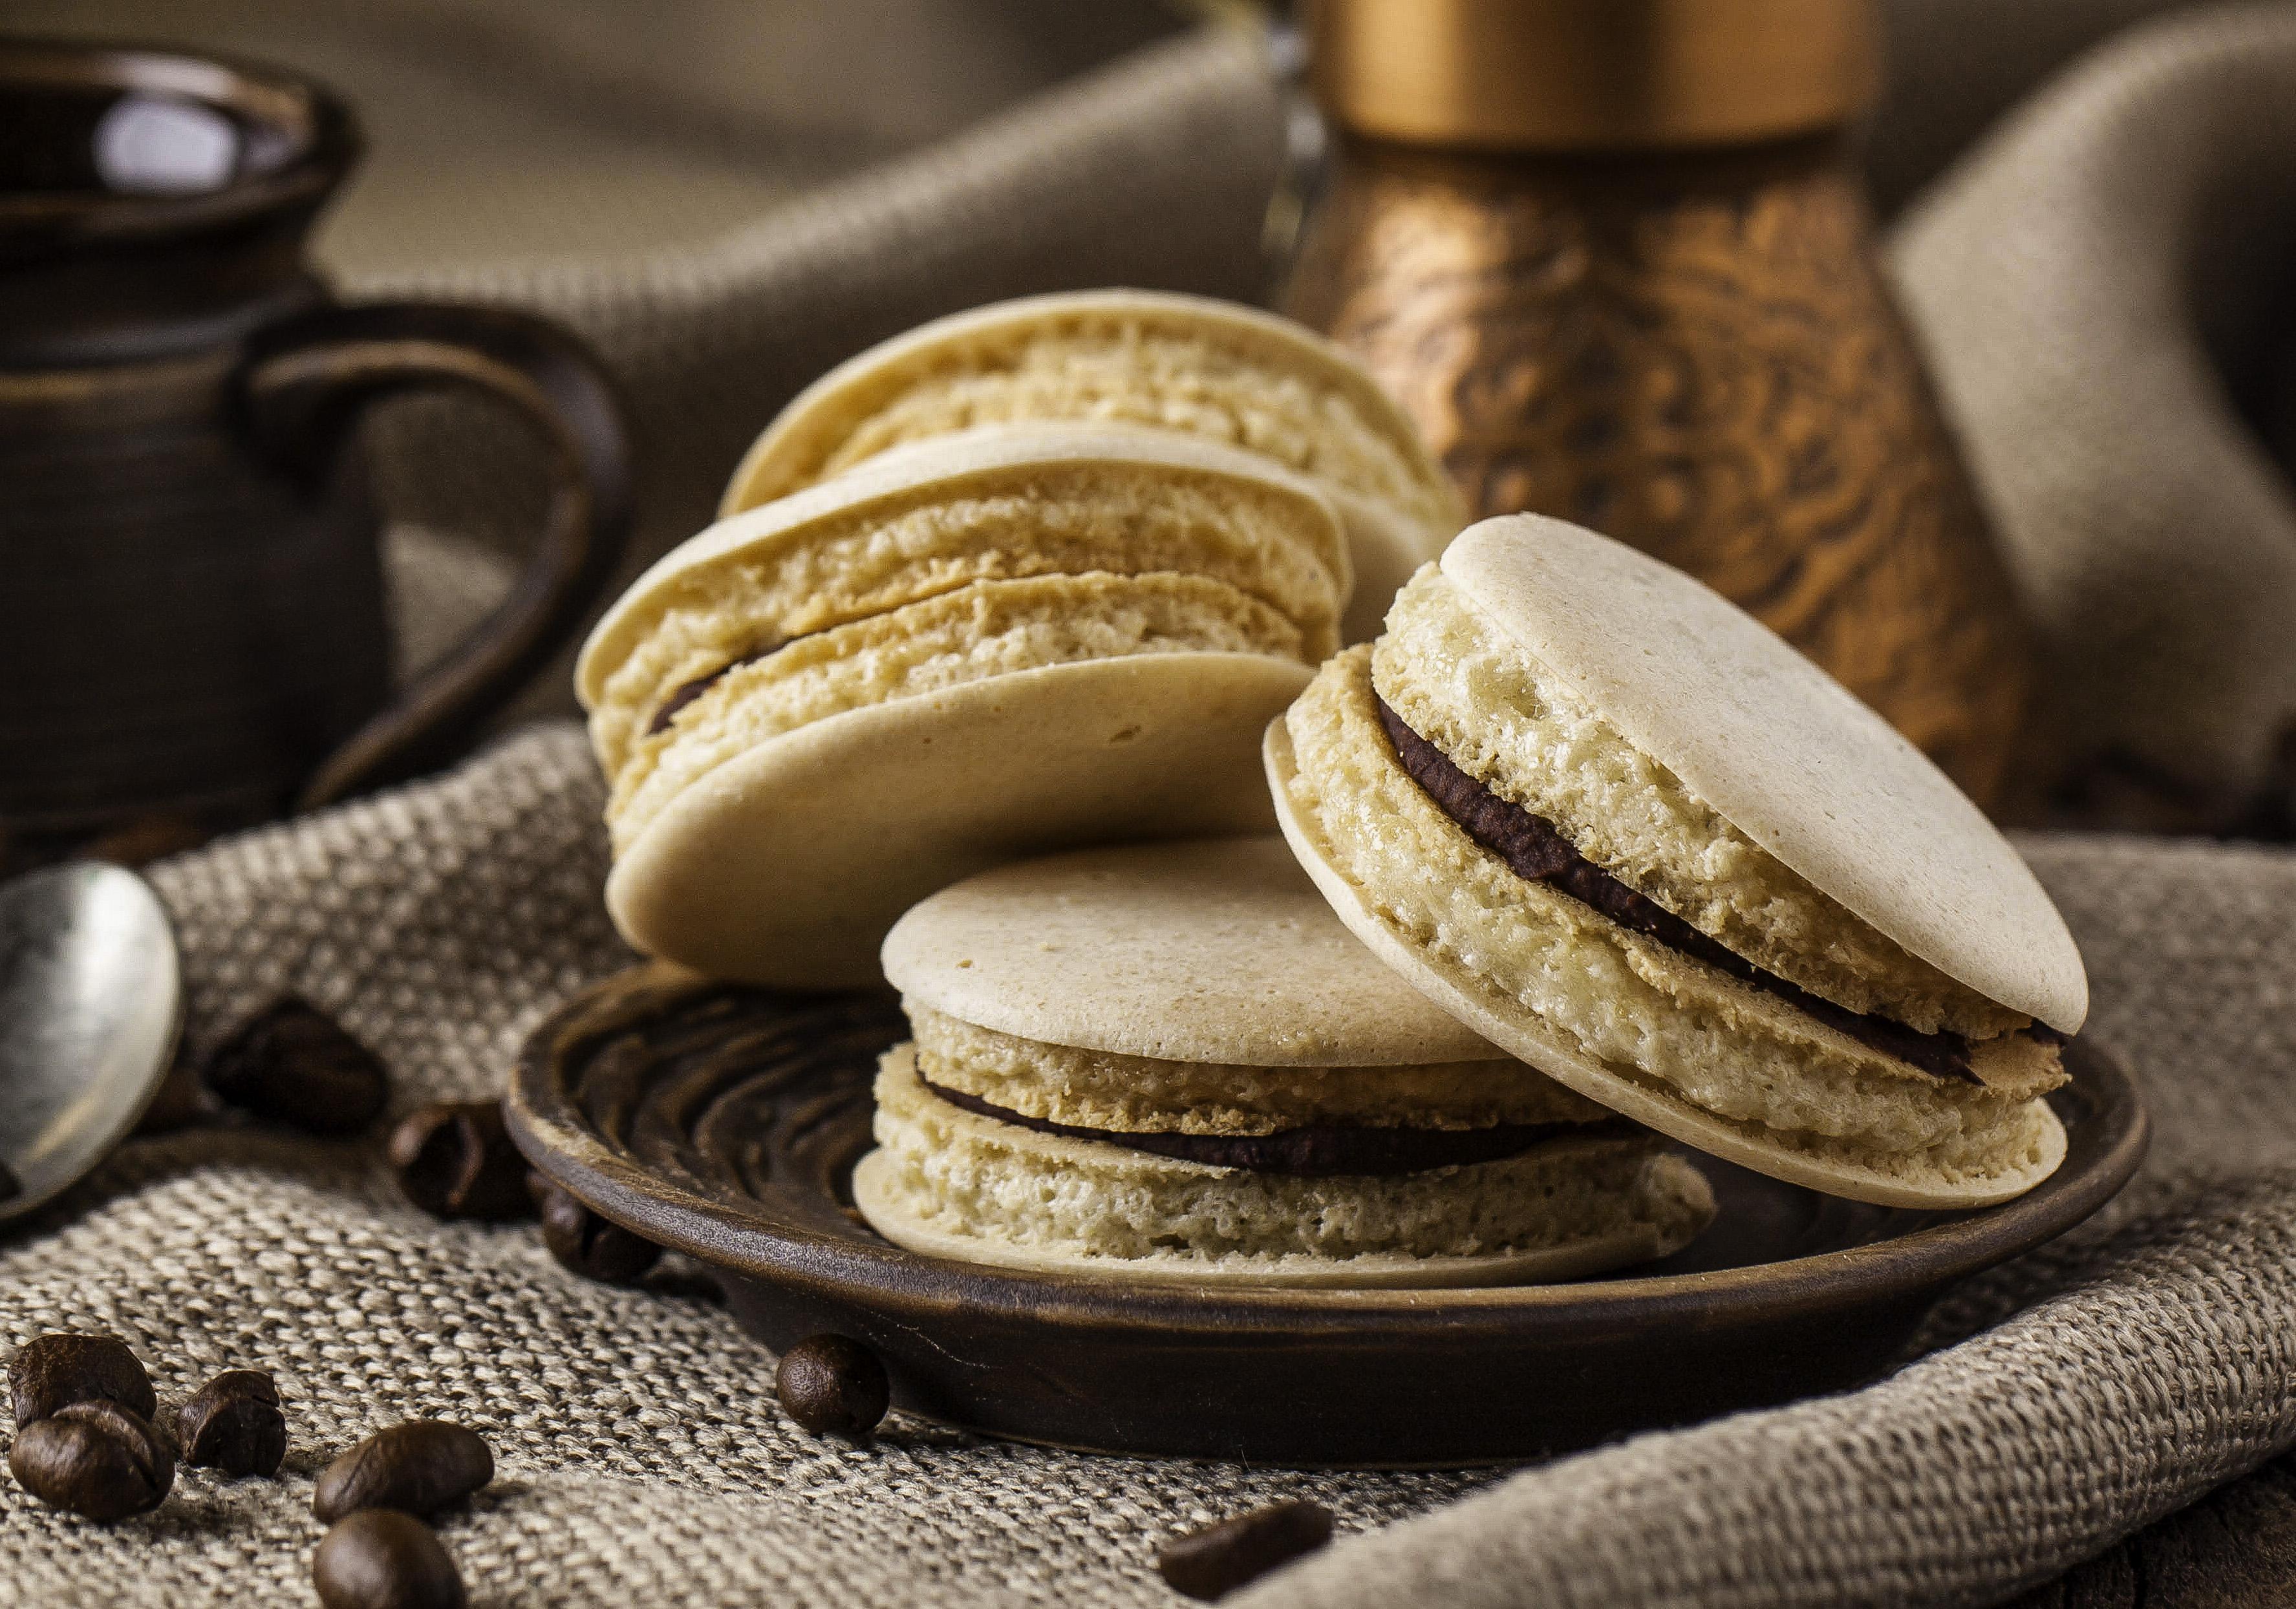 Dessert Recipe: Chocolate Coffee Macaroon Cookies